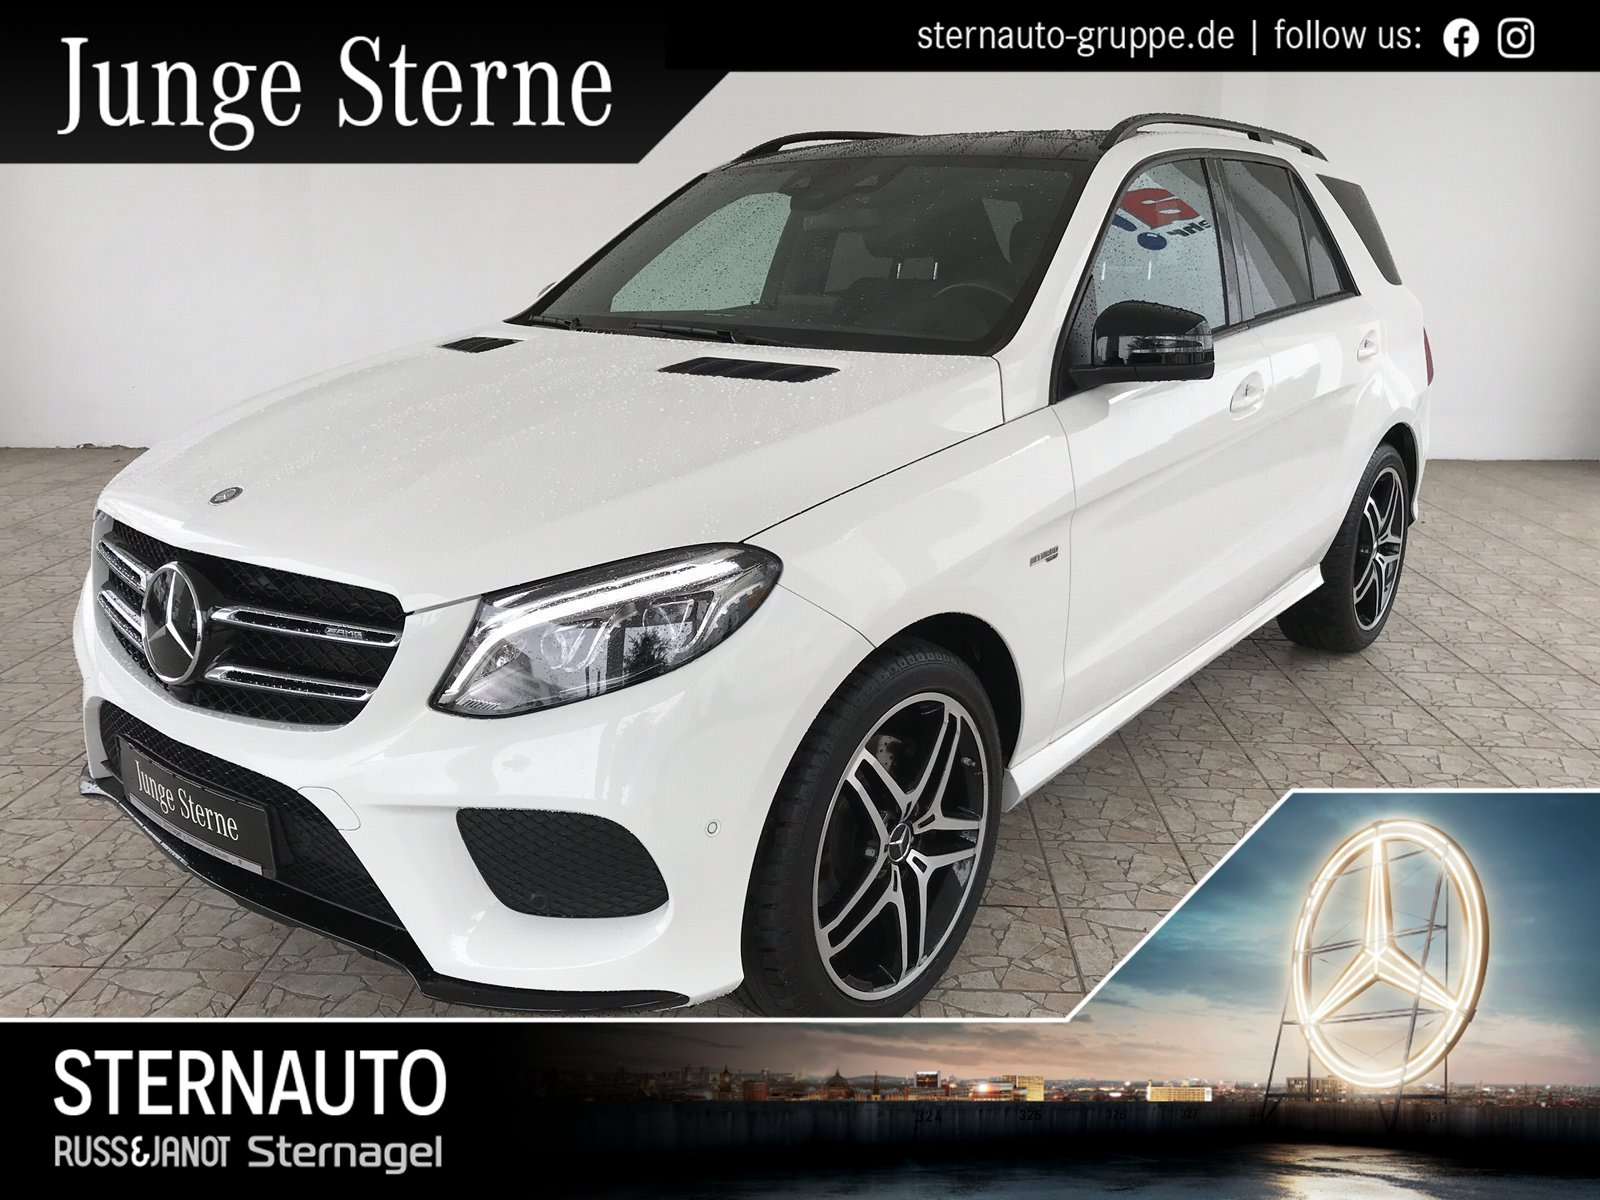 Mercedes-Benz GLE 43 AMG 4M COMAND/Standhzg./Pano.-Dach/AHK, Jahr 2017, Benzin